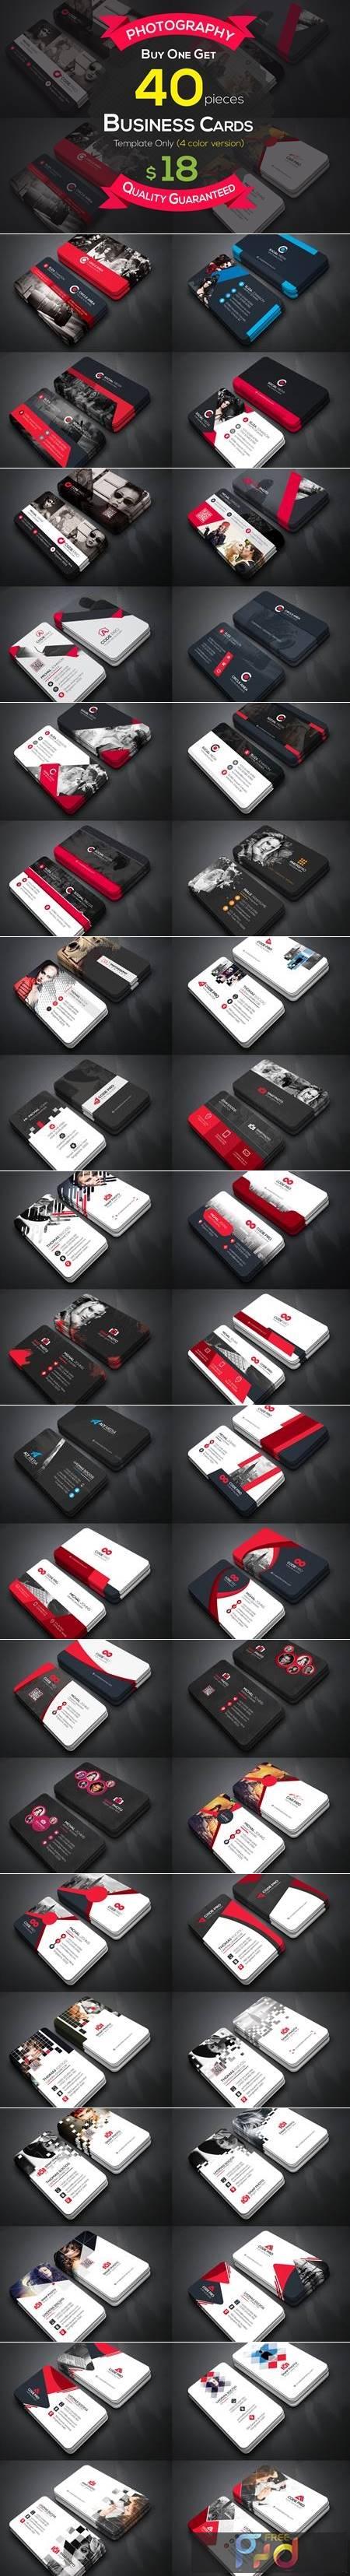 40 Photography Business Cards Bundle 4606406 1